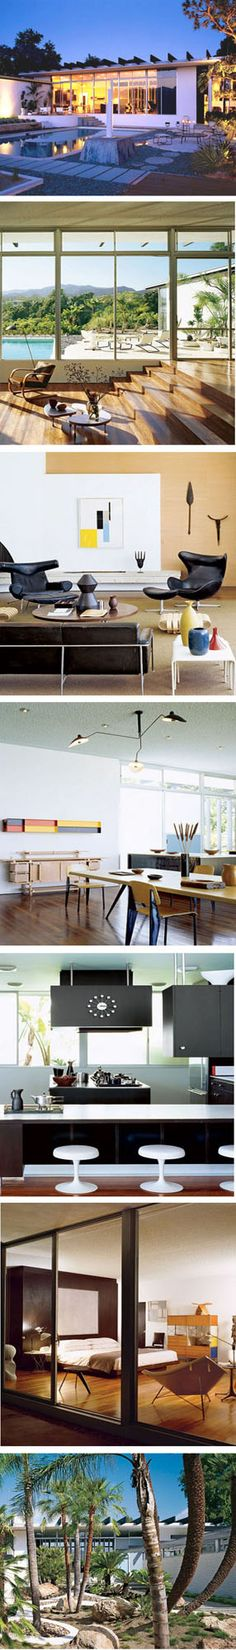 1963 Strick House, Santa Monica, California, USA, by Oscar Niemeyer